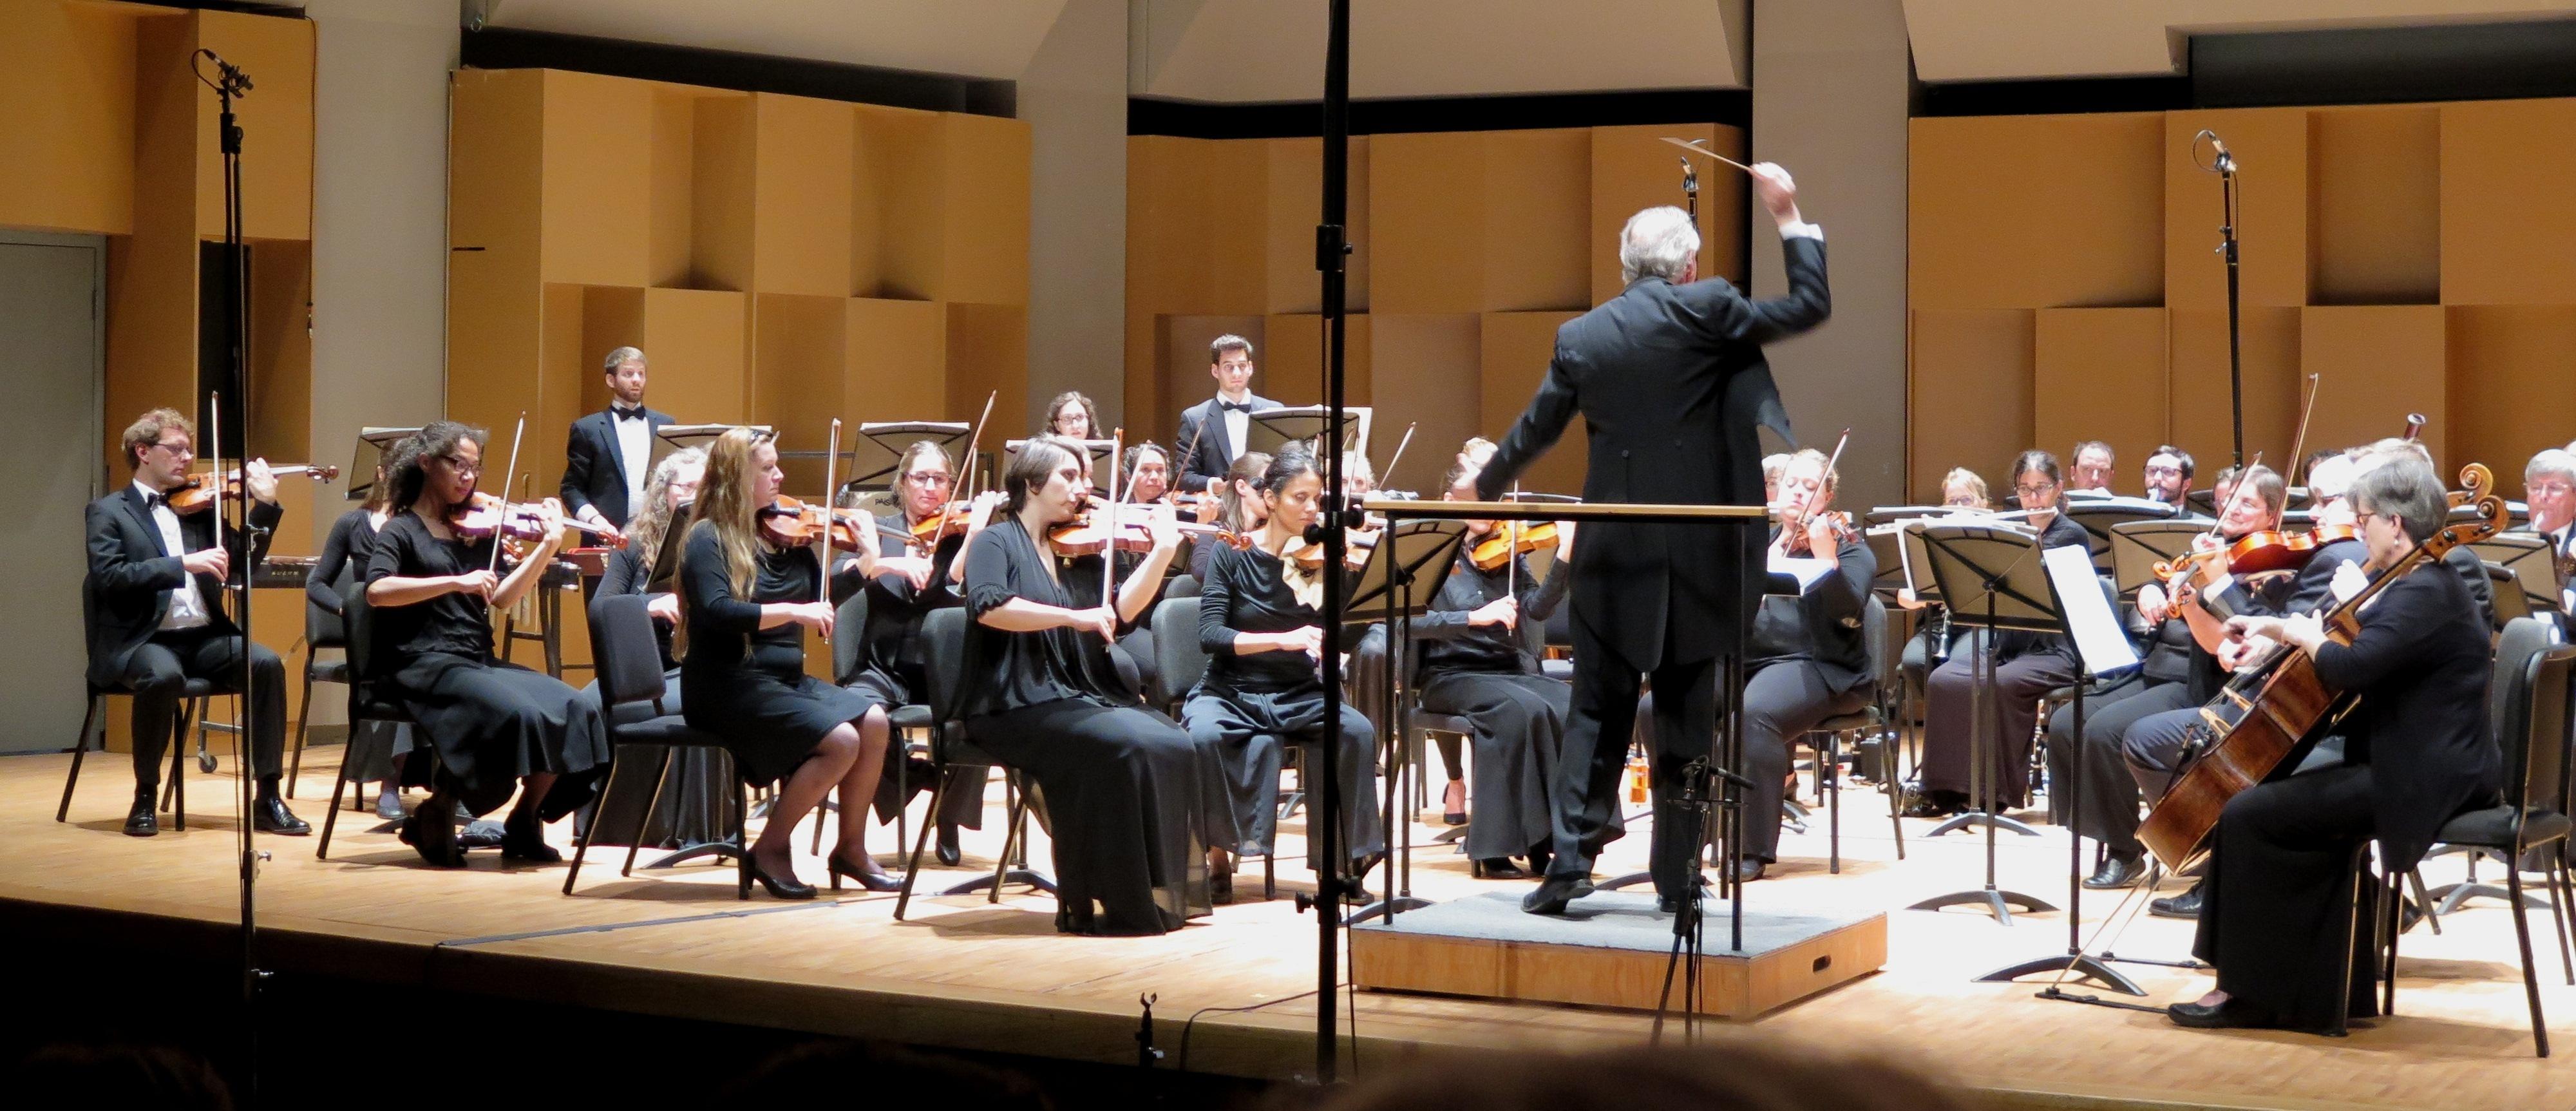 Concert 11 juin 2016, Salle Pollack